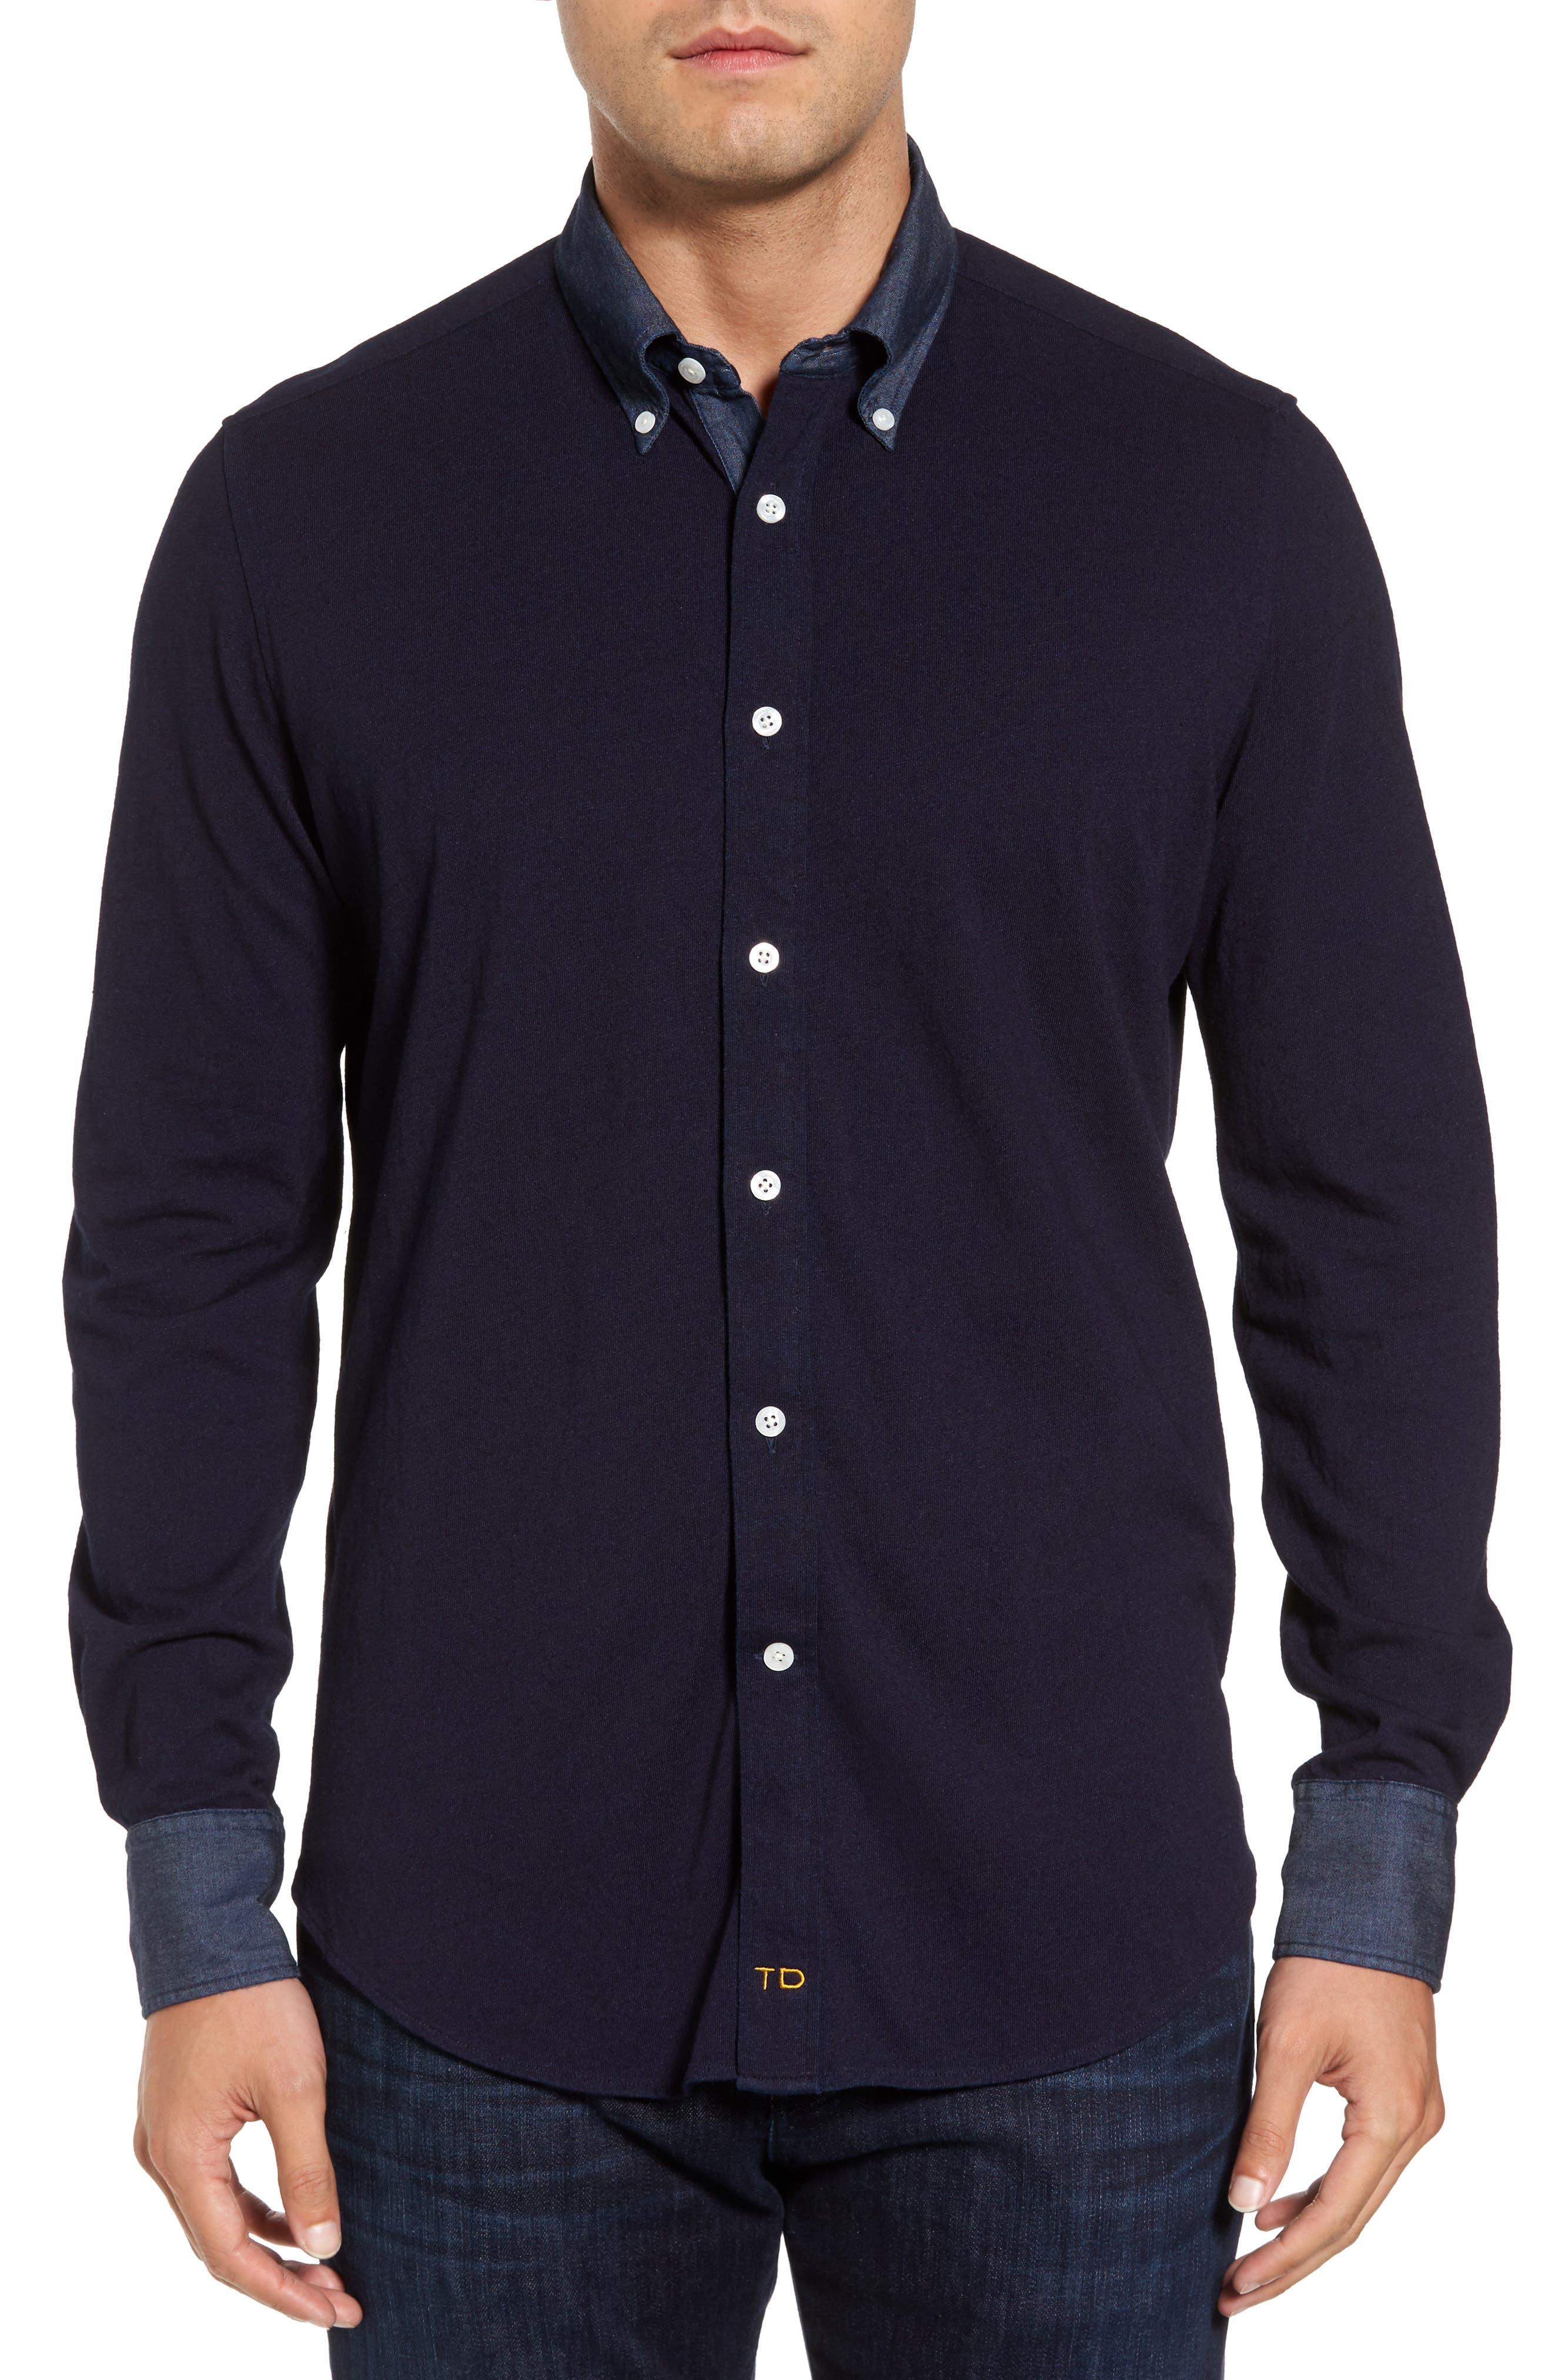 Main Image - Thomas Dean Regular Fit Chambray Trim Jersey Shirt